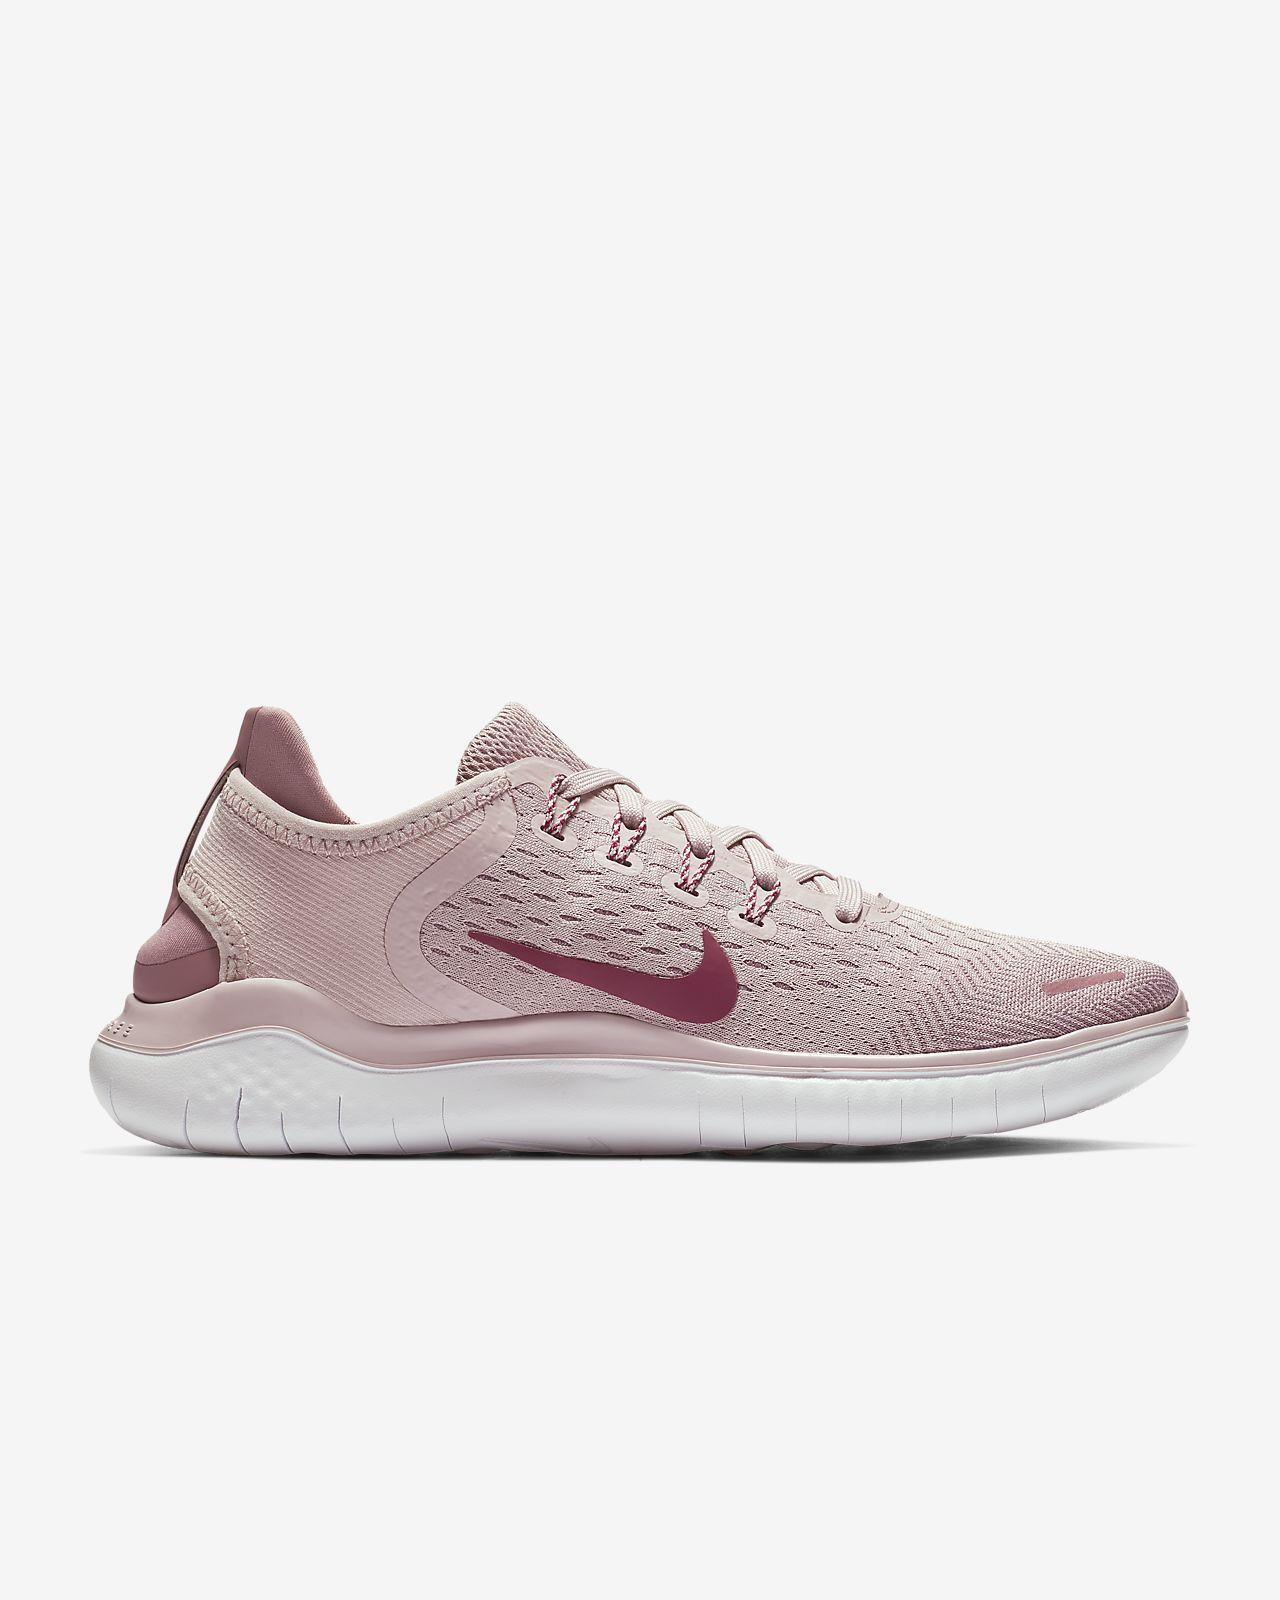 67d720b6a6db Nike Free RN 2018 Women s Running Shoe. Nike.com SG